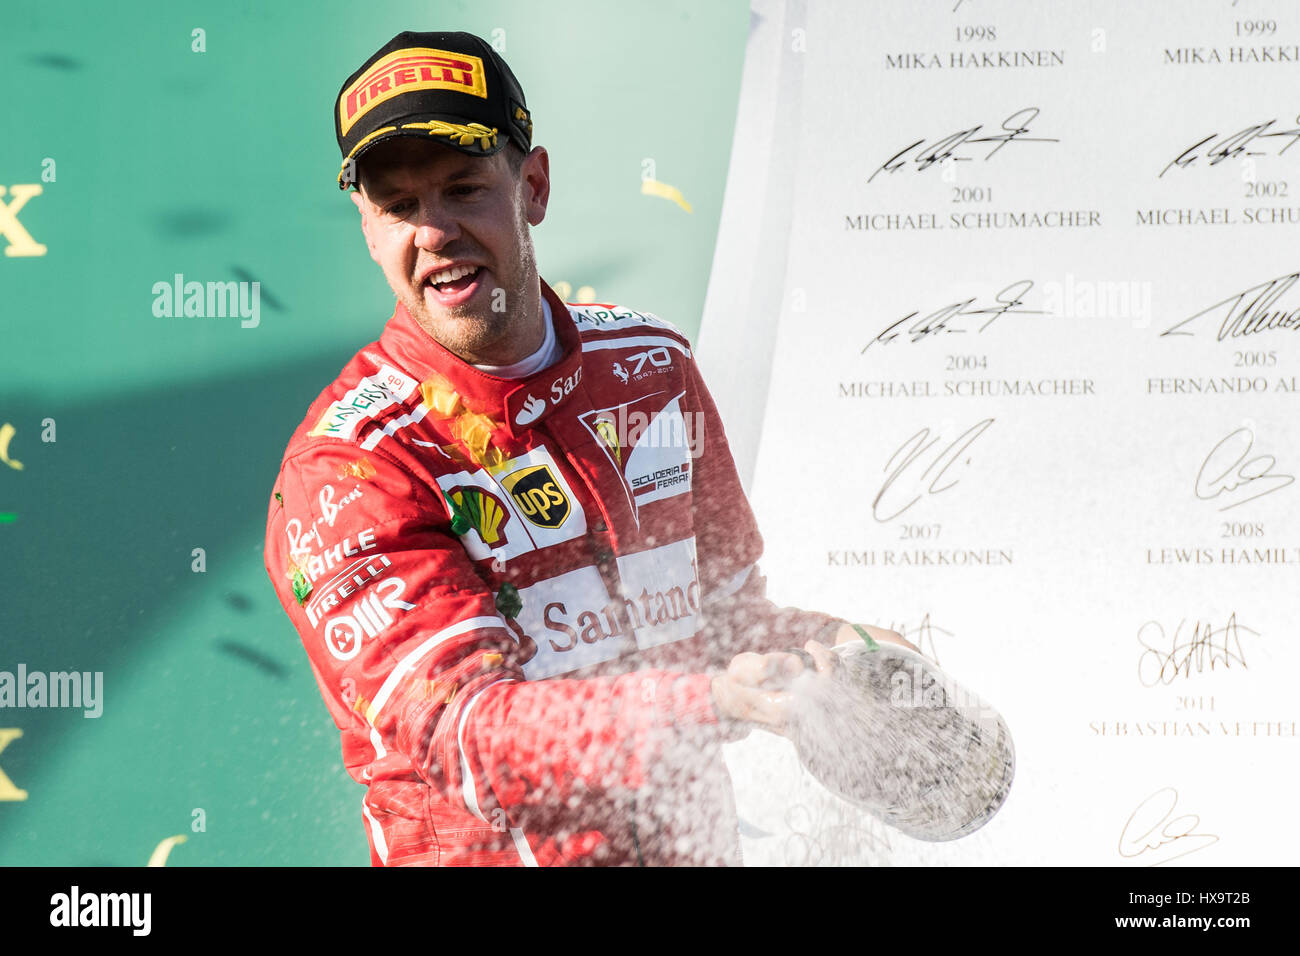 Melbourne, Australia. 26 Mar, 2017. Scuderia Ferrari el piloto alemán Sebastian Vettel celebra durante la ceremonia Imagen De Stock